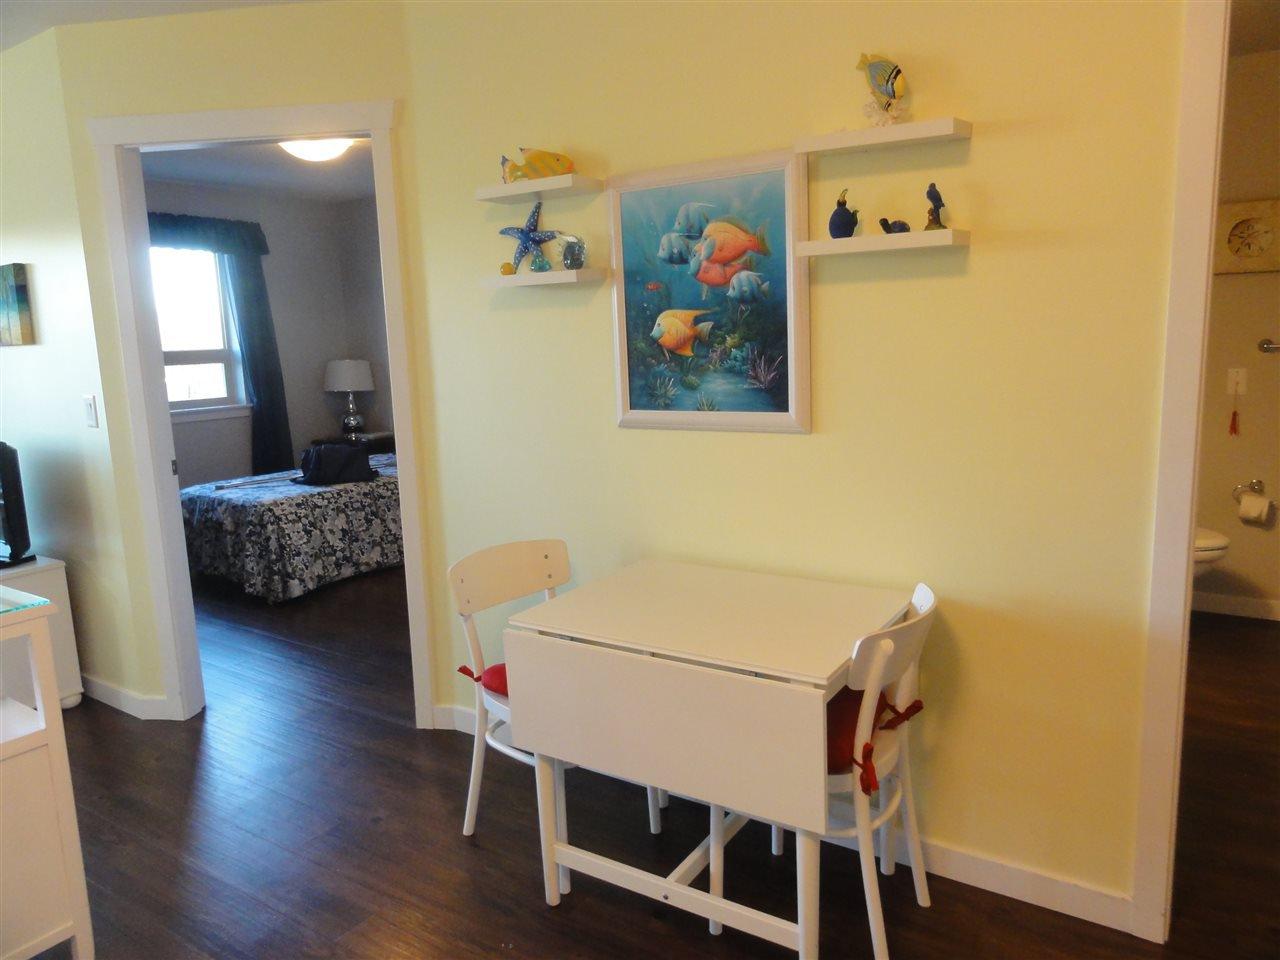 "Photo 4: Photos: 431 22323 48 Avenue in Langley: Murrayville Condo for sale in ""AVALON GARDENS"" : MLS®# R2134591"